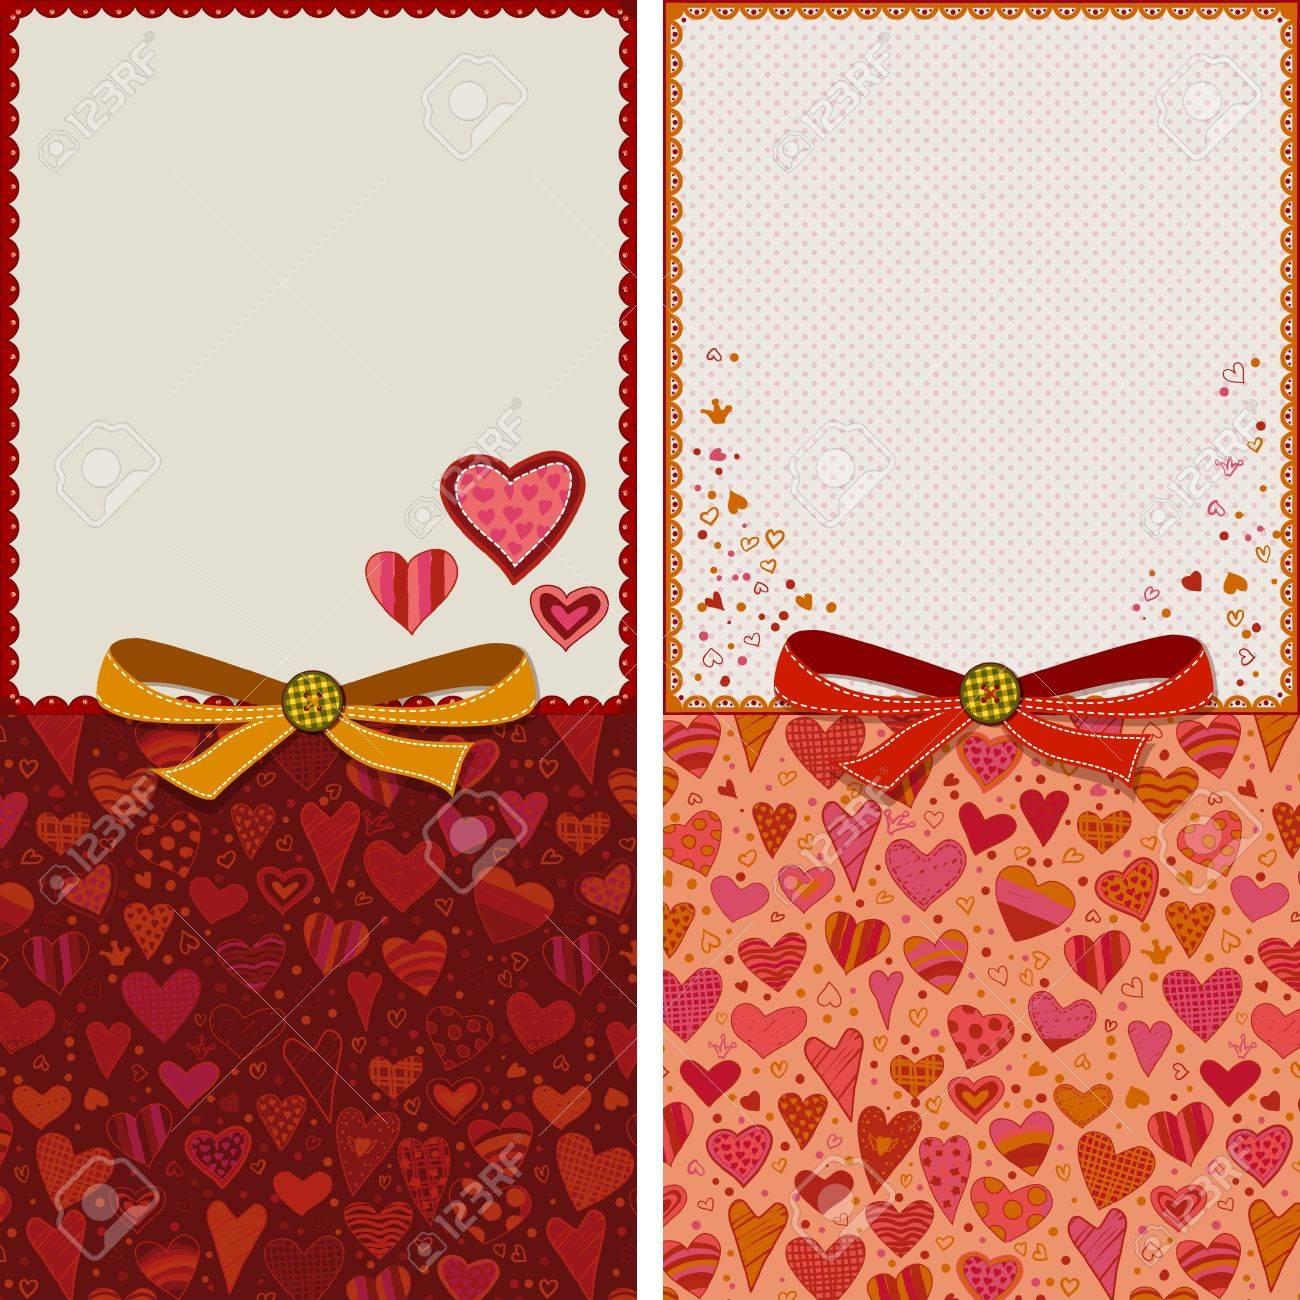 Wedding Valentines Relationship Birthday Anniversary Greeting Cards Templates Stock Vector